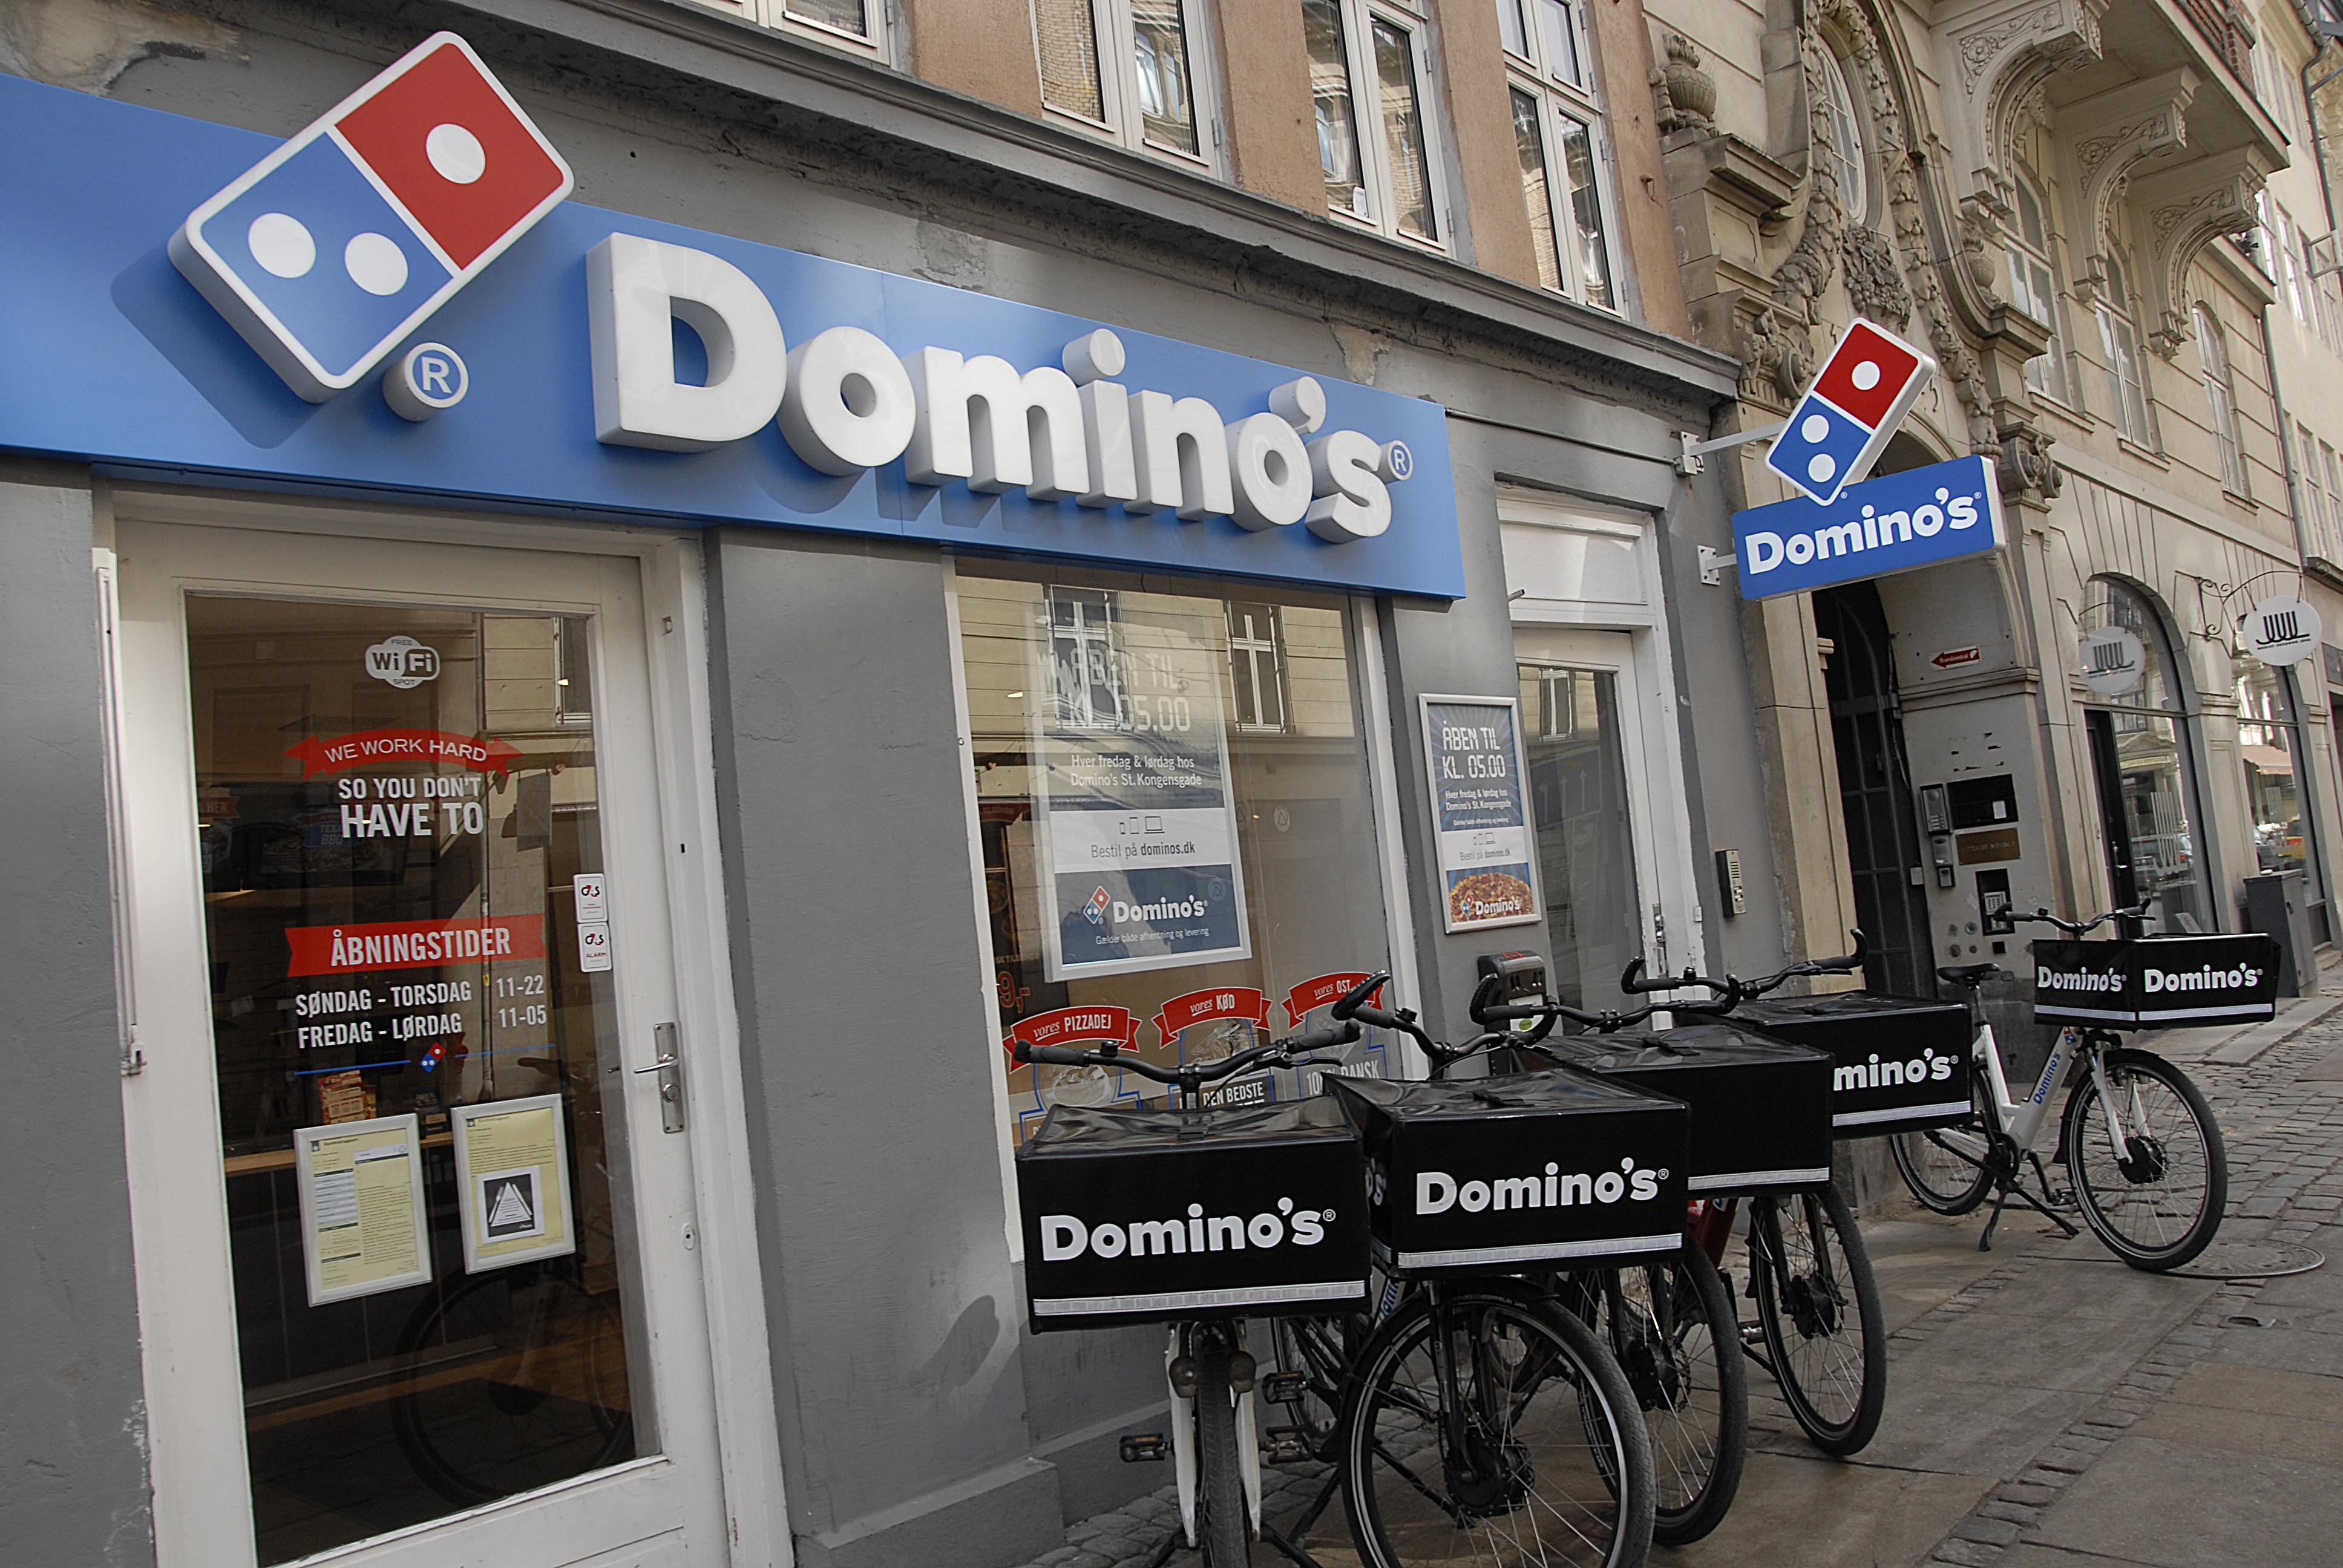 Dominos pizza delivery by bikes in Copenhagen, Denmark